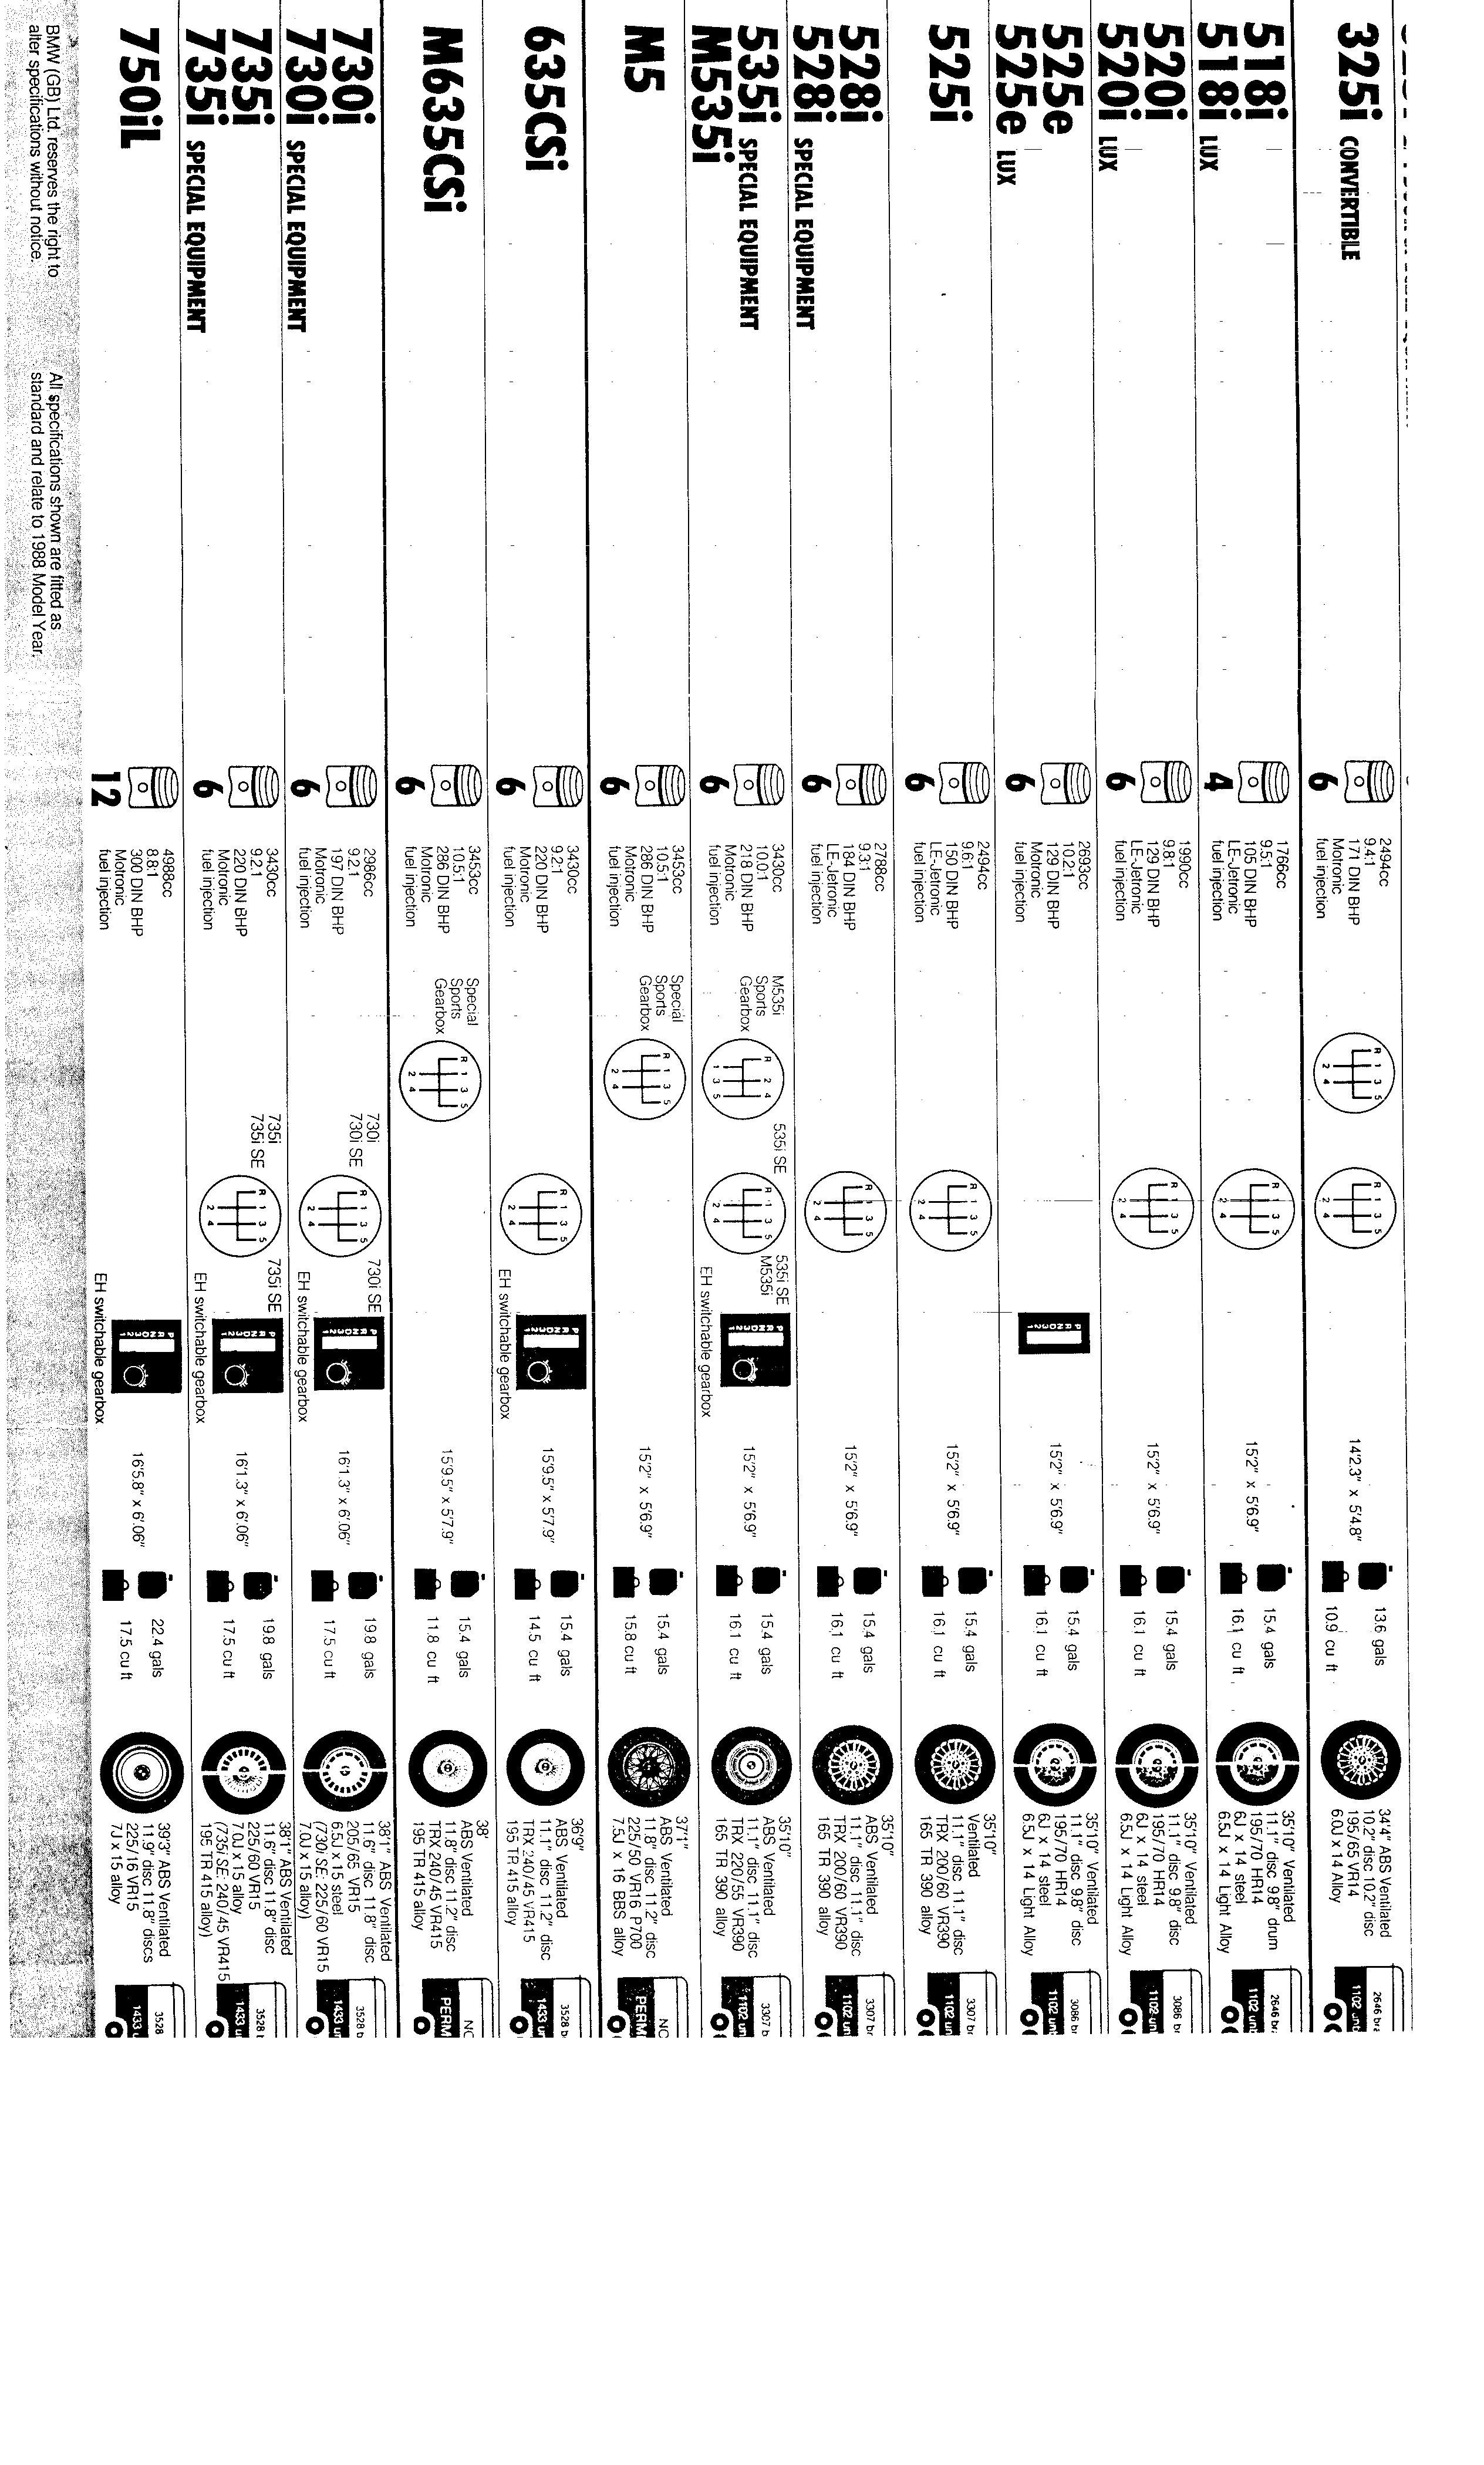 E28 M535i Information